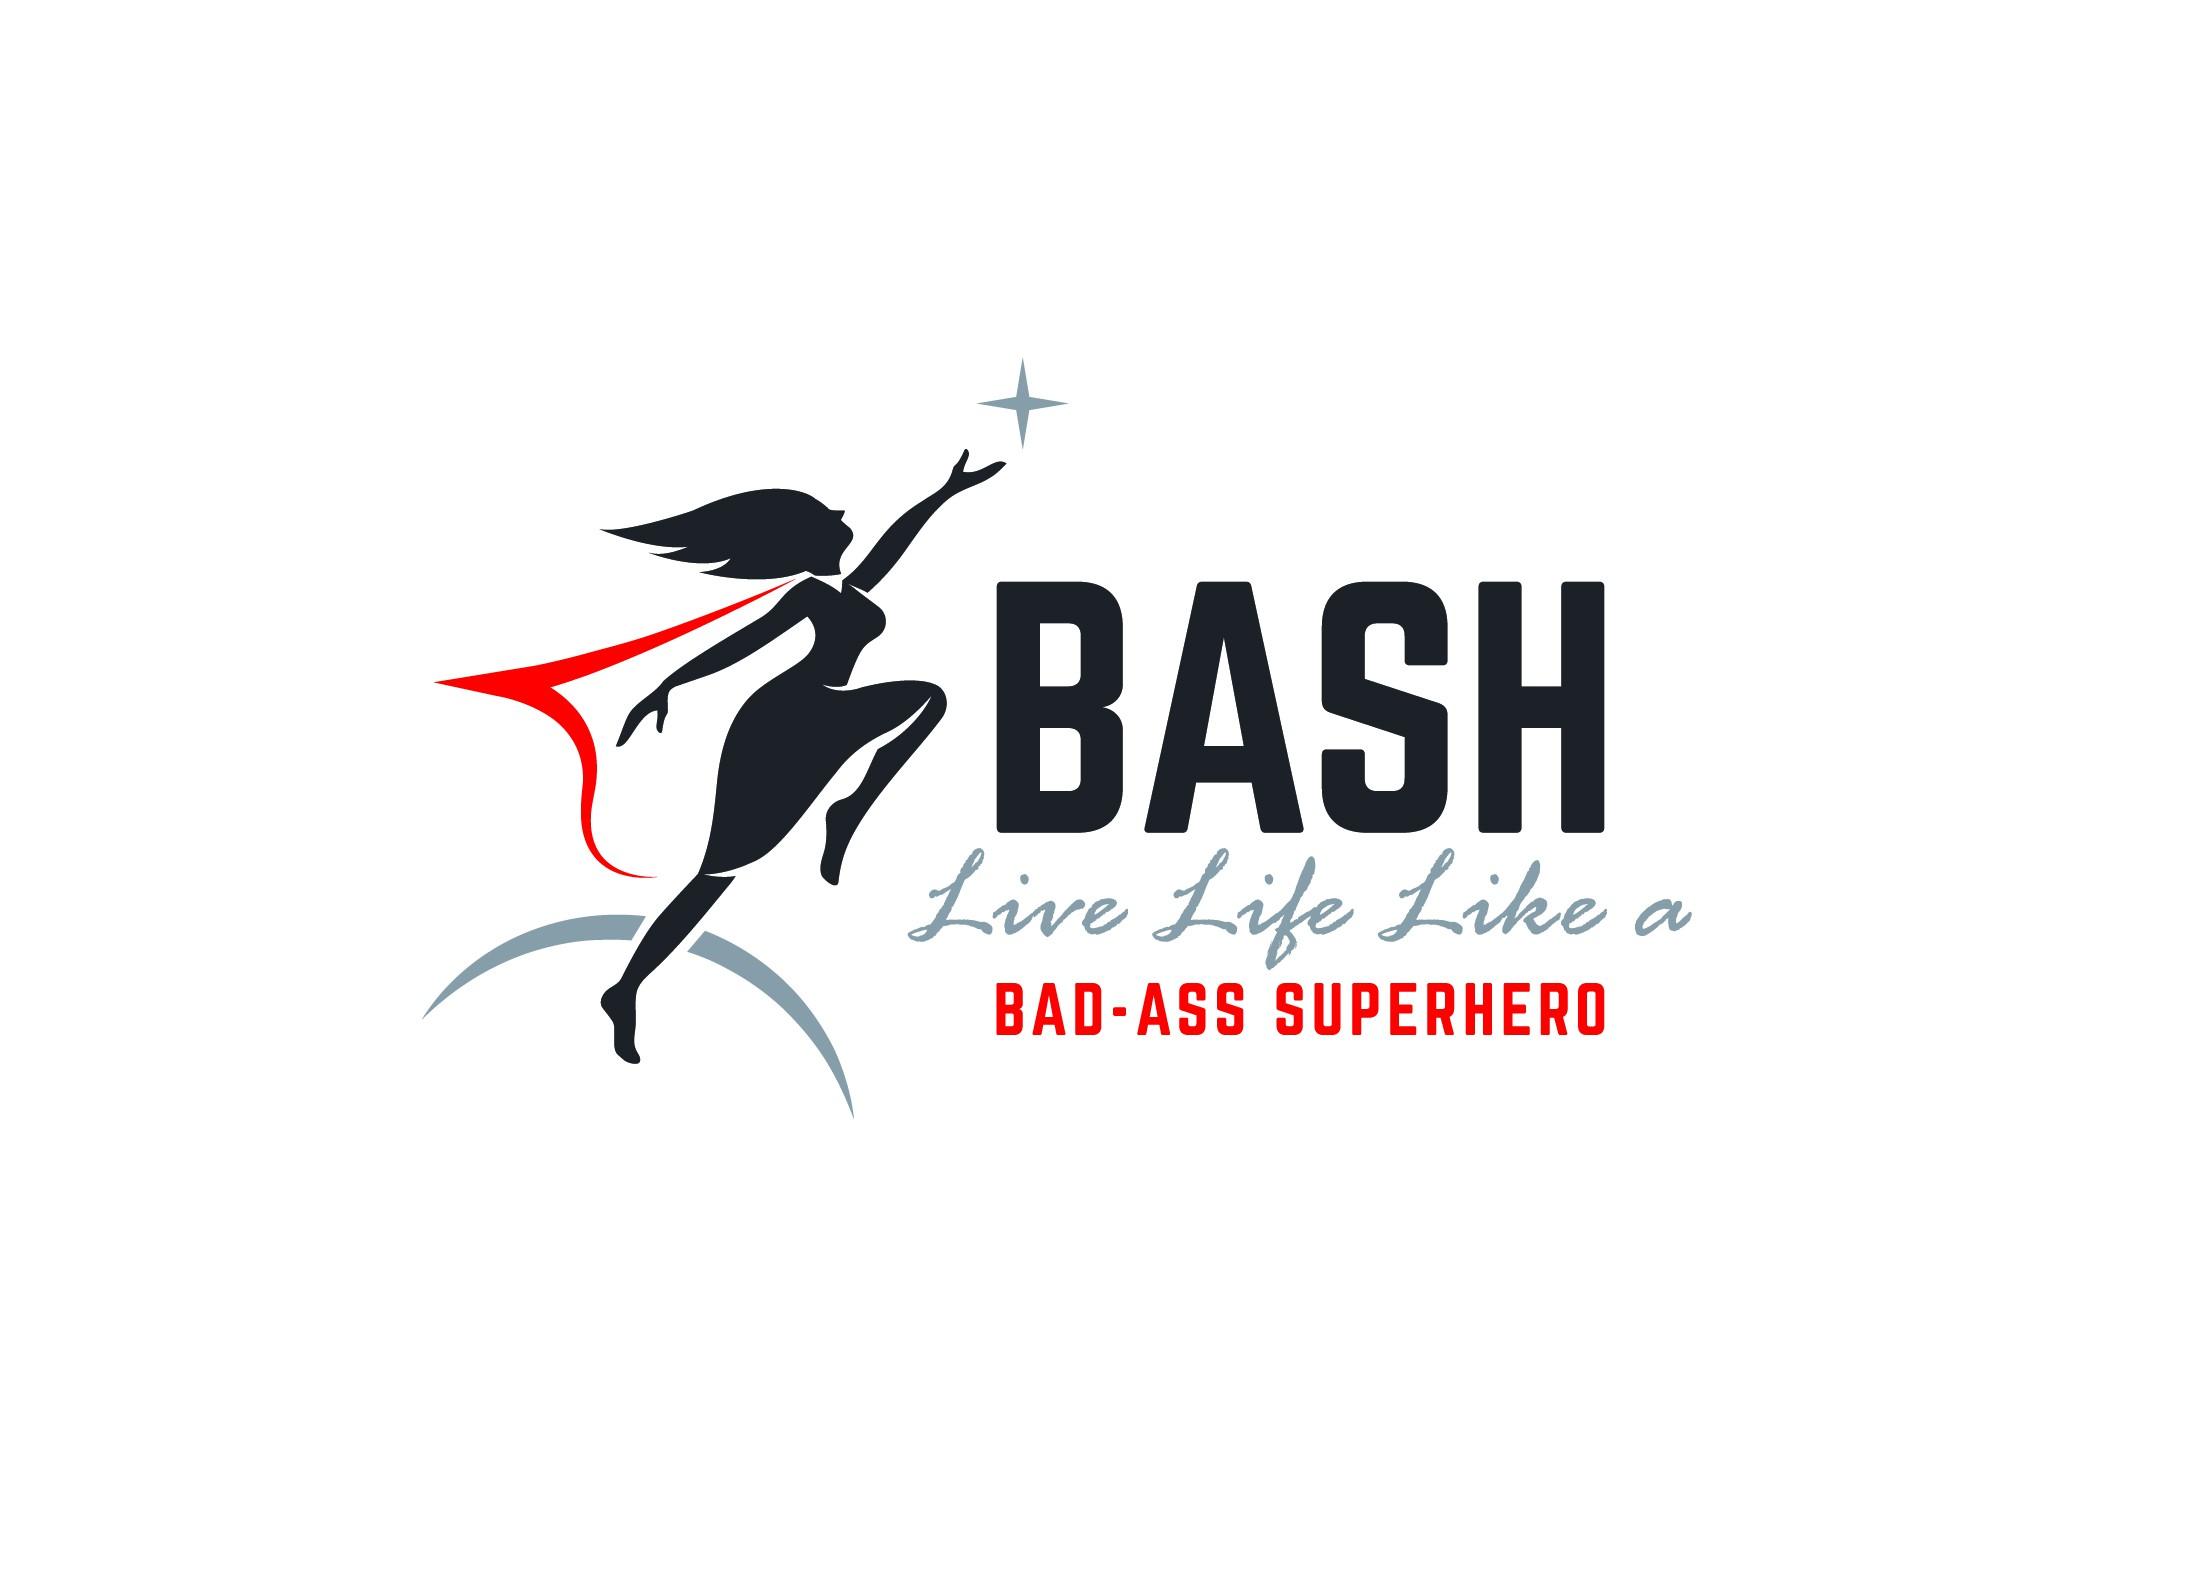 BASH-tastic Logos Only